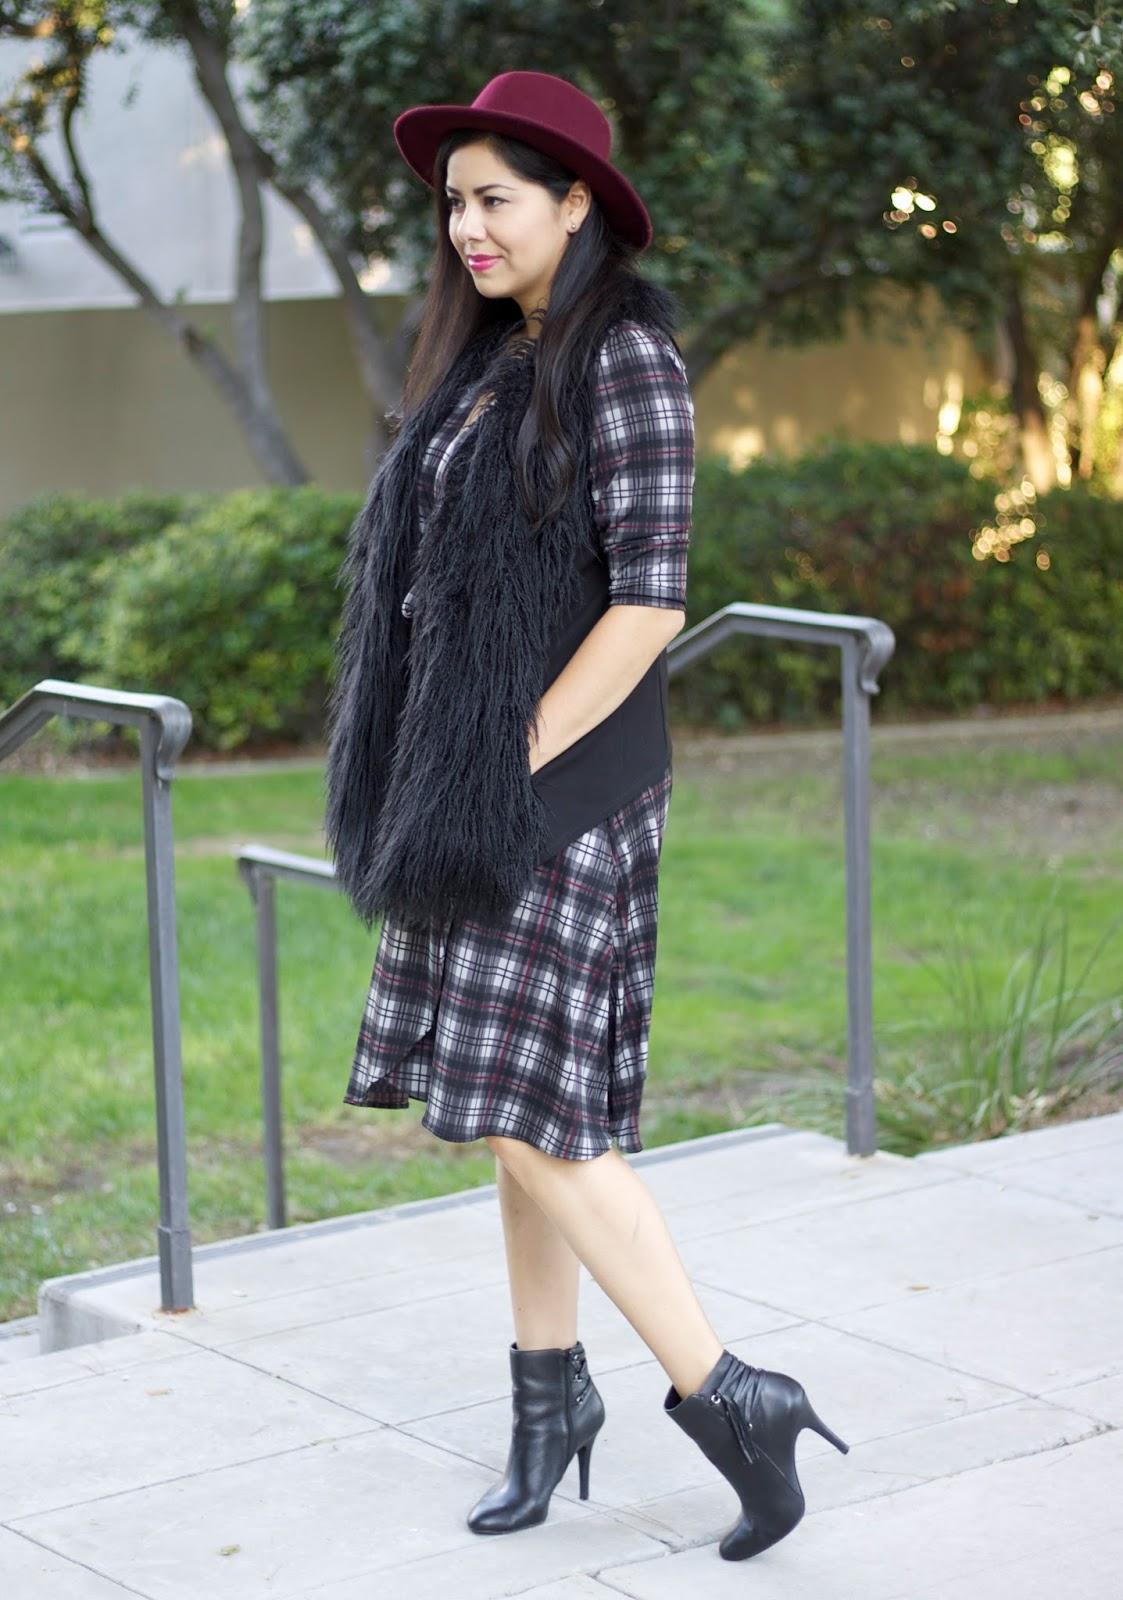 Karina Dresses, Karina Dresses plaid, fall fashion 2015, fall style 2015, socal fashion blogger